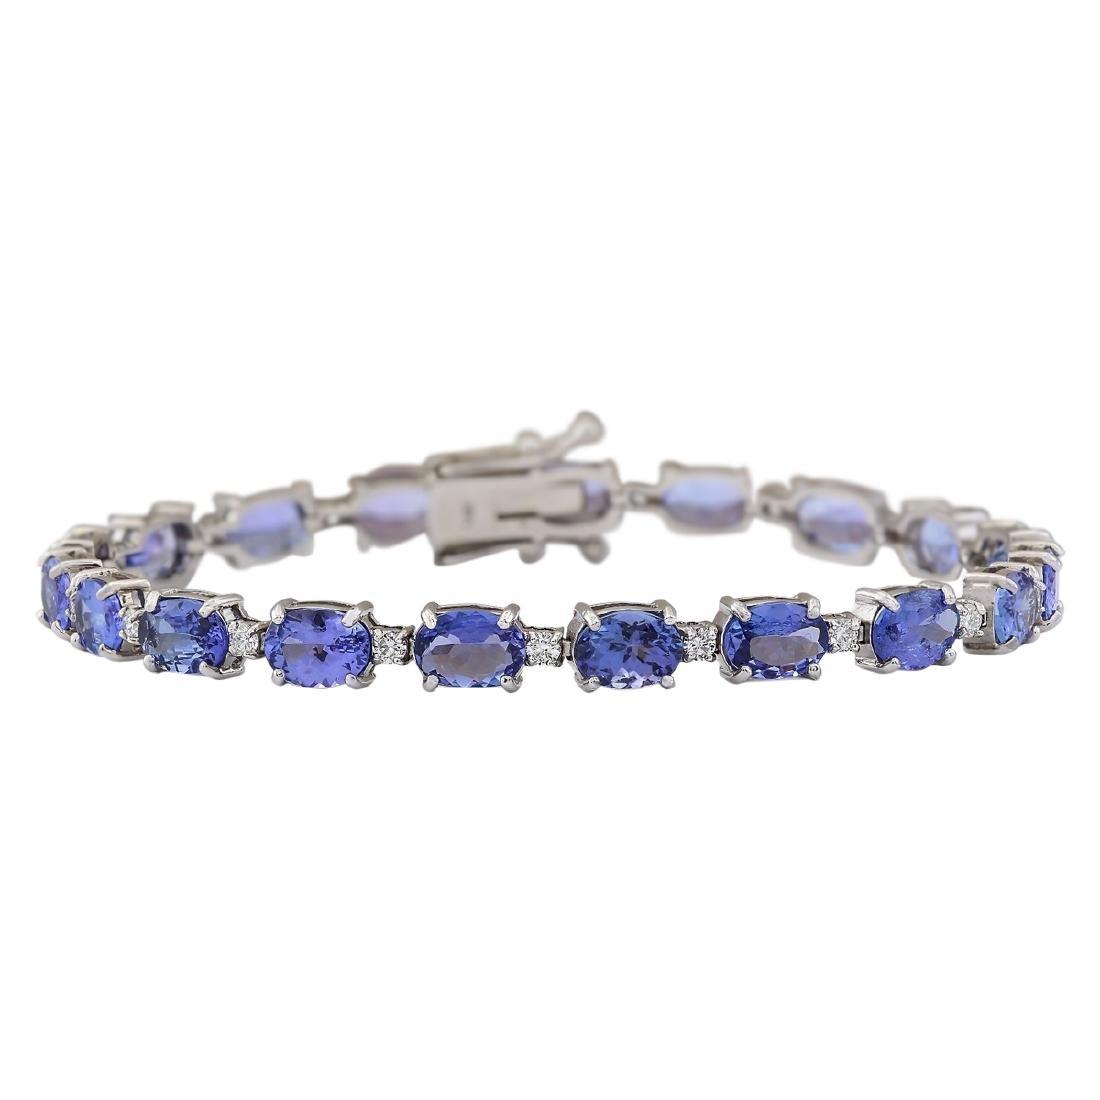 20.30 CTW Natural Tanzanite And Diamond Bracelet In 18K